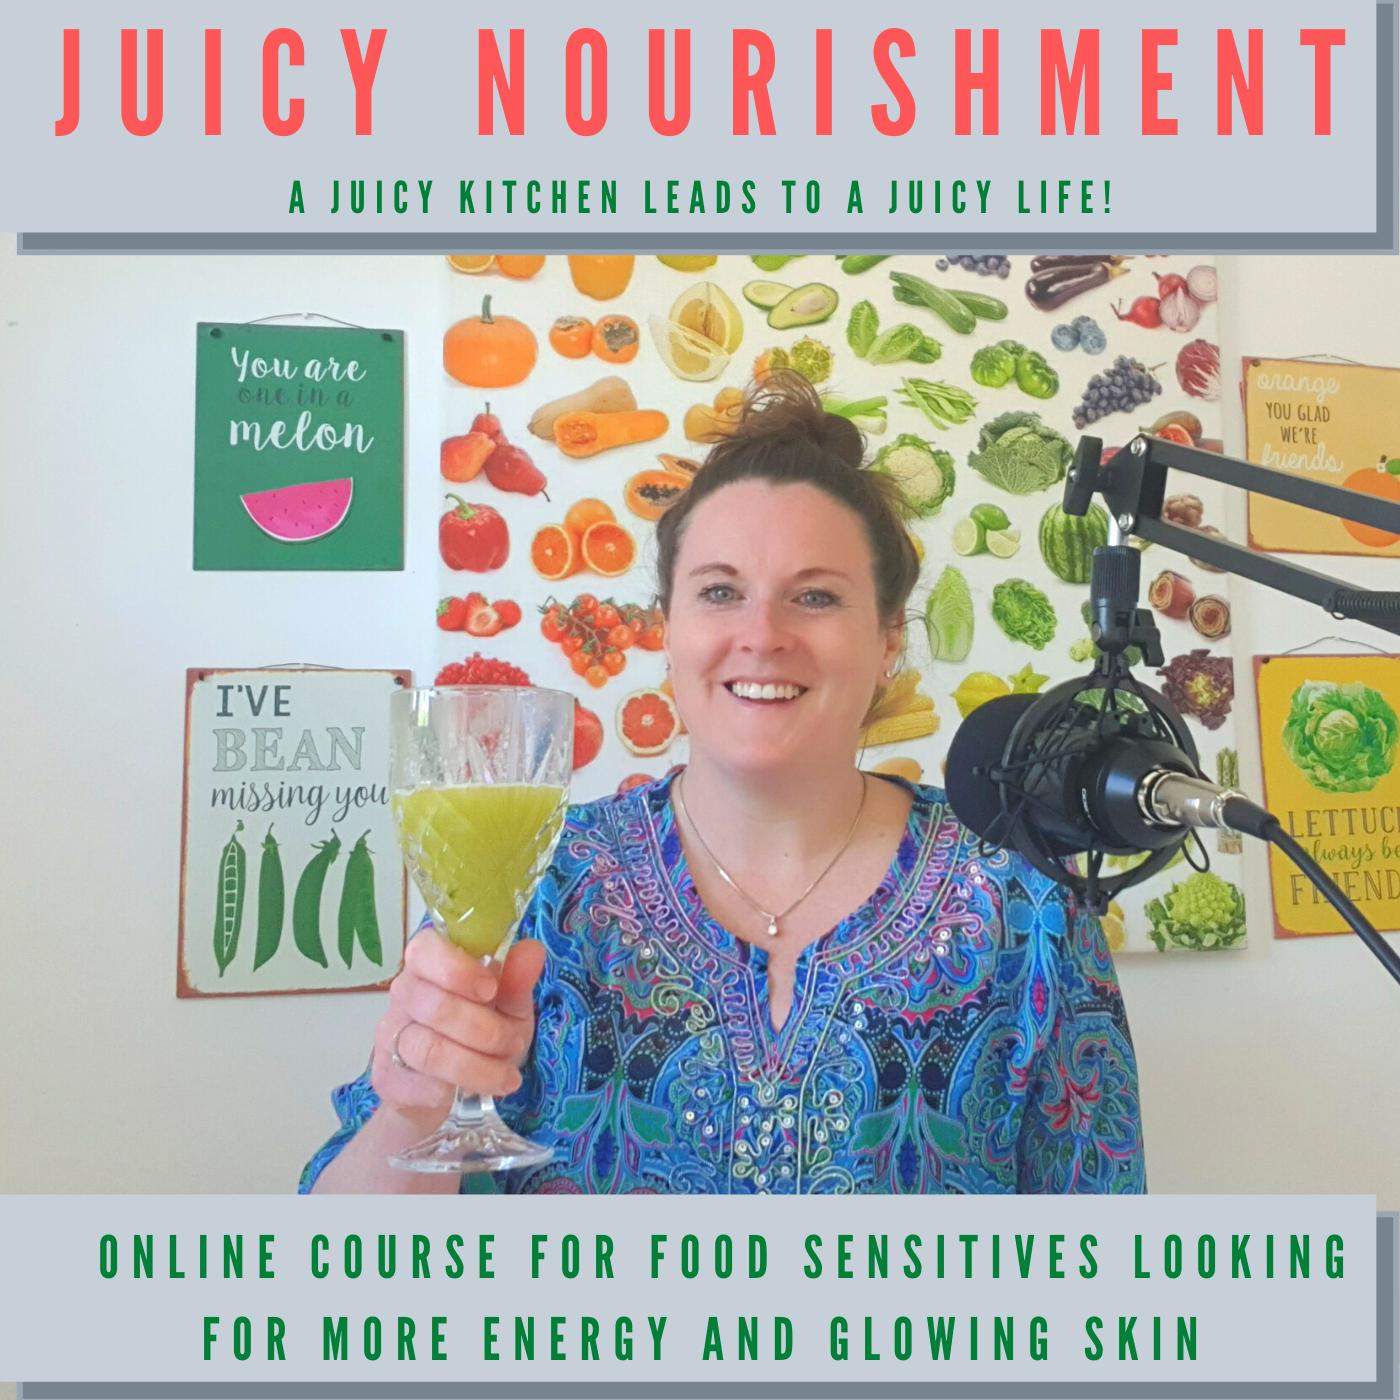 Juice Therapy Course - Juicy Nourishment